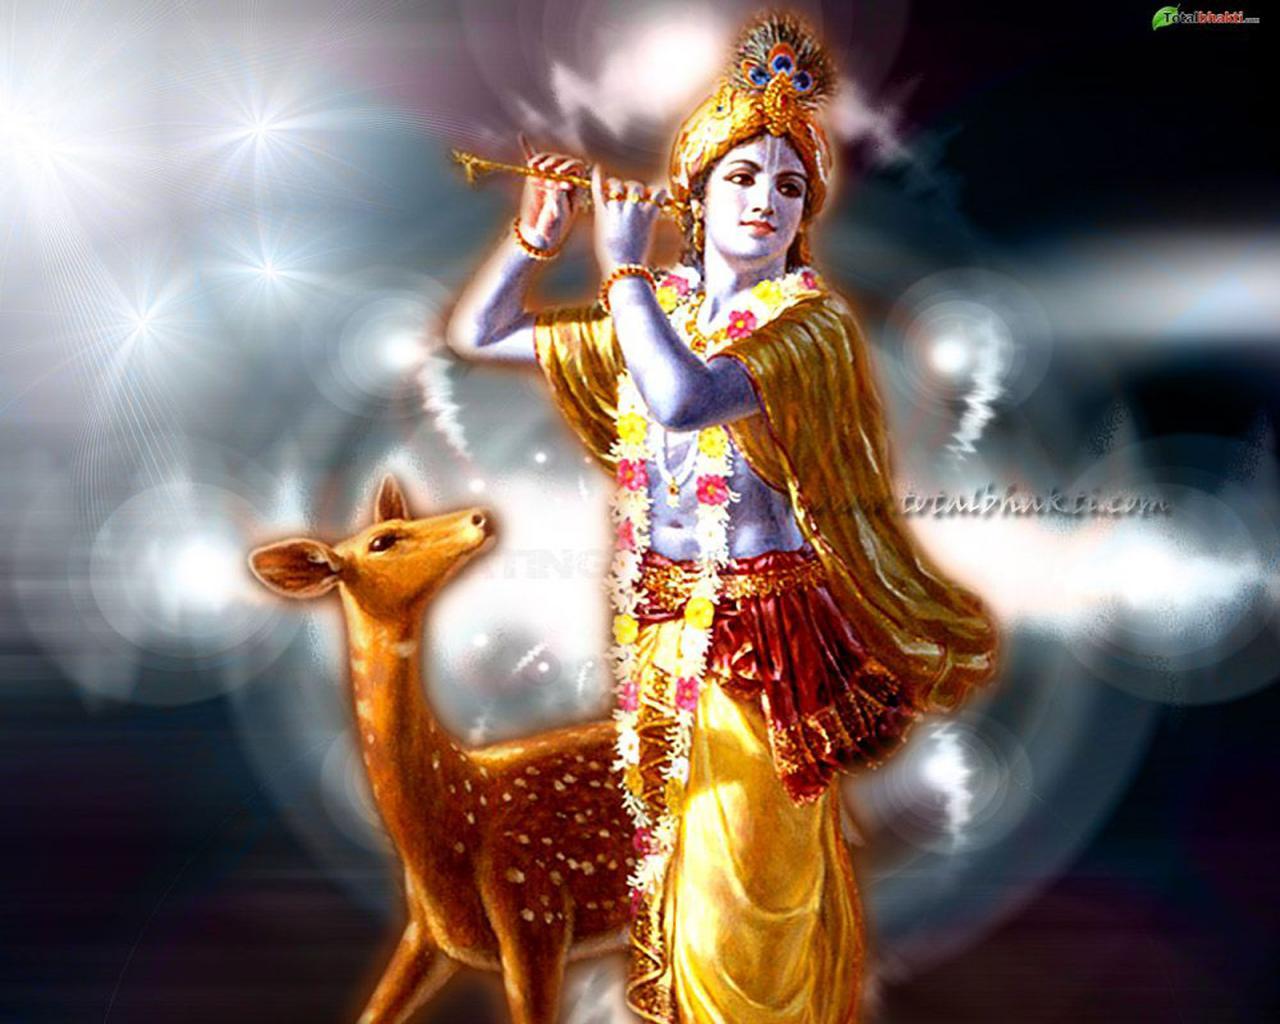 http://3.bp.blogspot.com/-a2BMwPW6XWc/TlepnlvFK0I/AAAAAAAAAk0/ipF9yaH8_d0/s1600/Lord-Krishna-Wallpapers-27.jpg